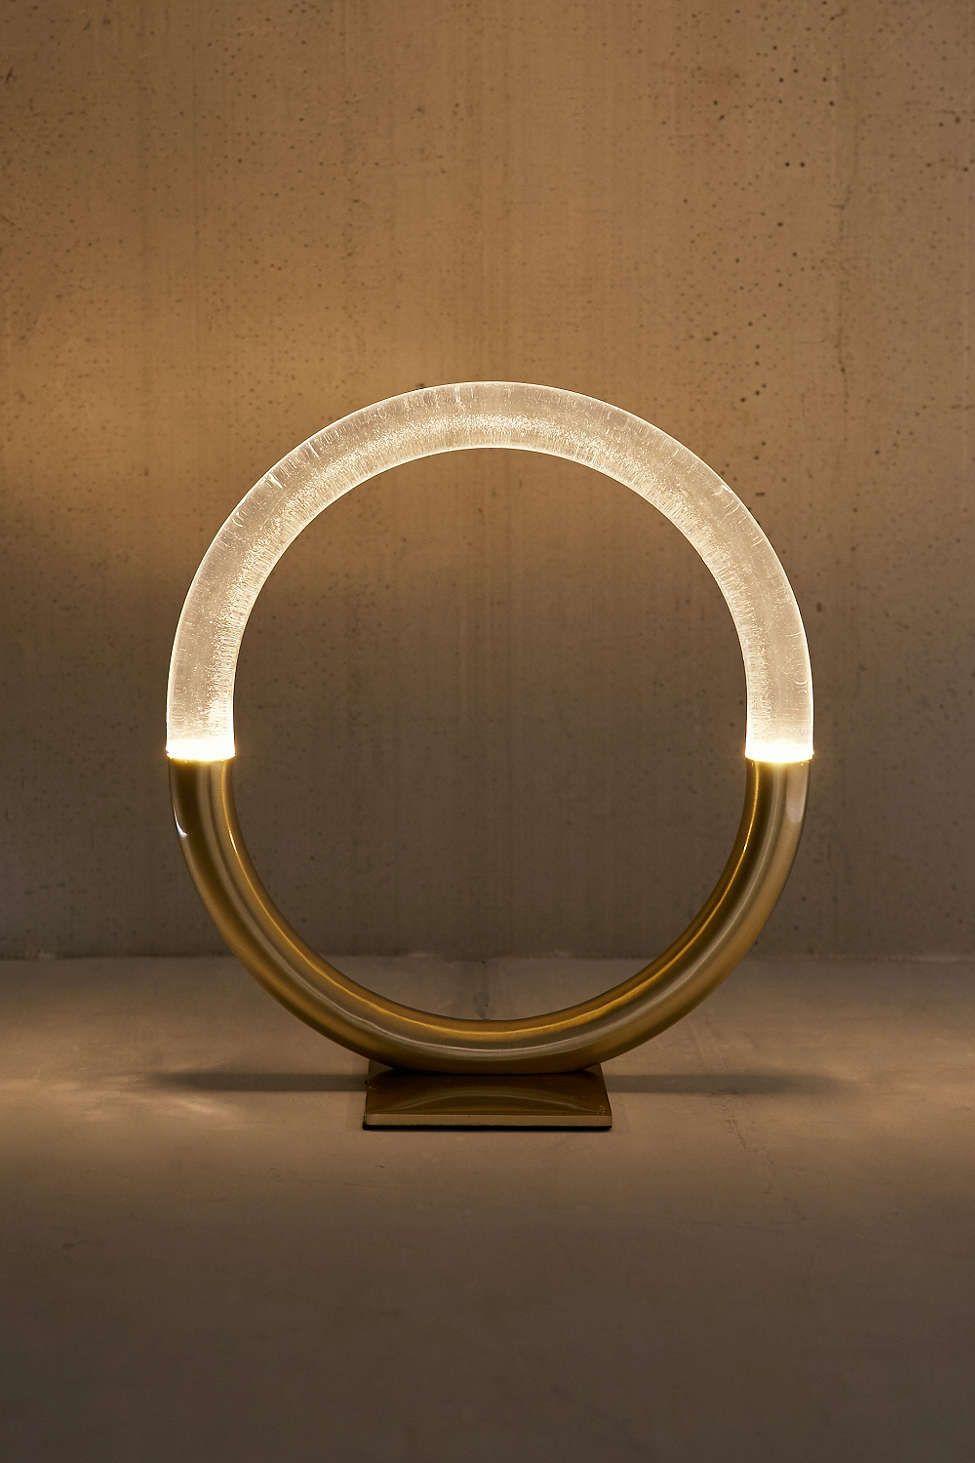 Helios LED Table Lamp | Pinterest - Lampen, Kroonluchters en Verlichting